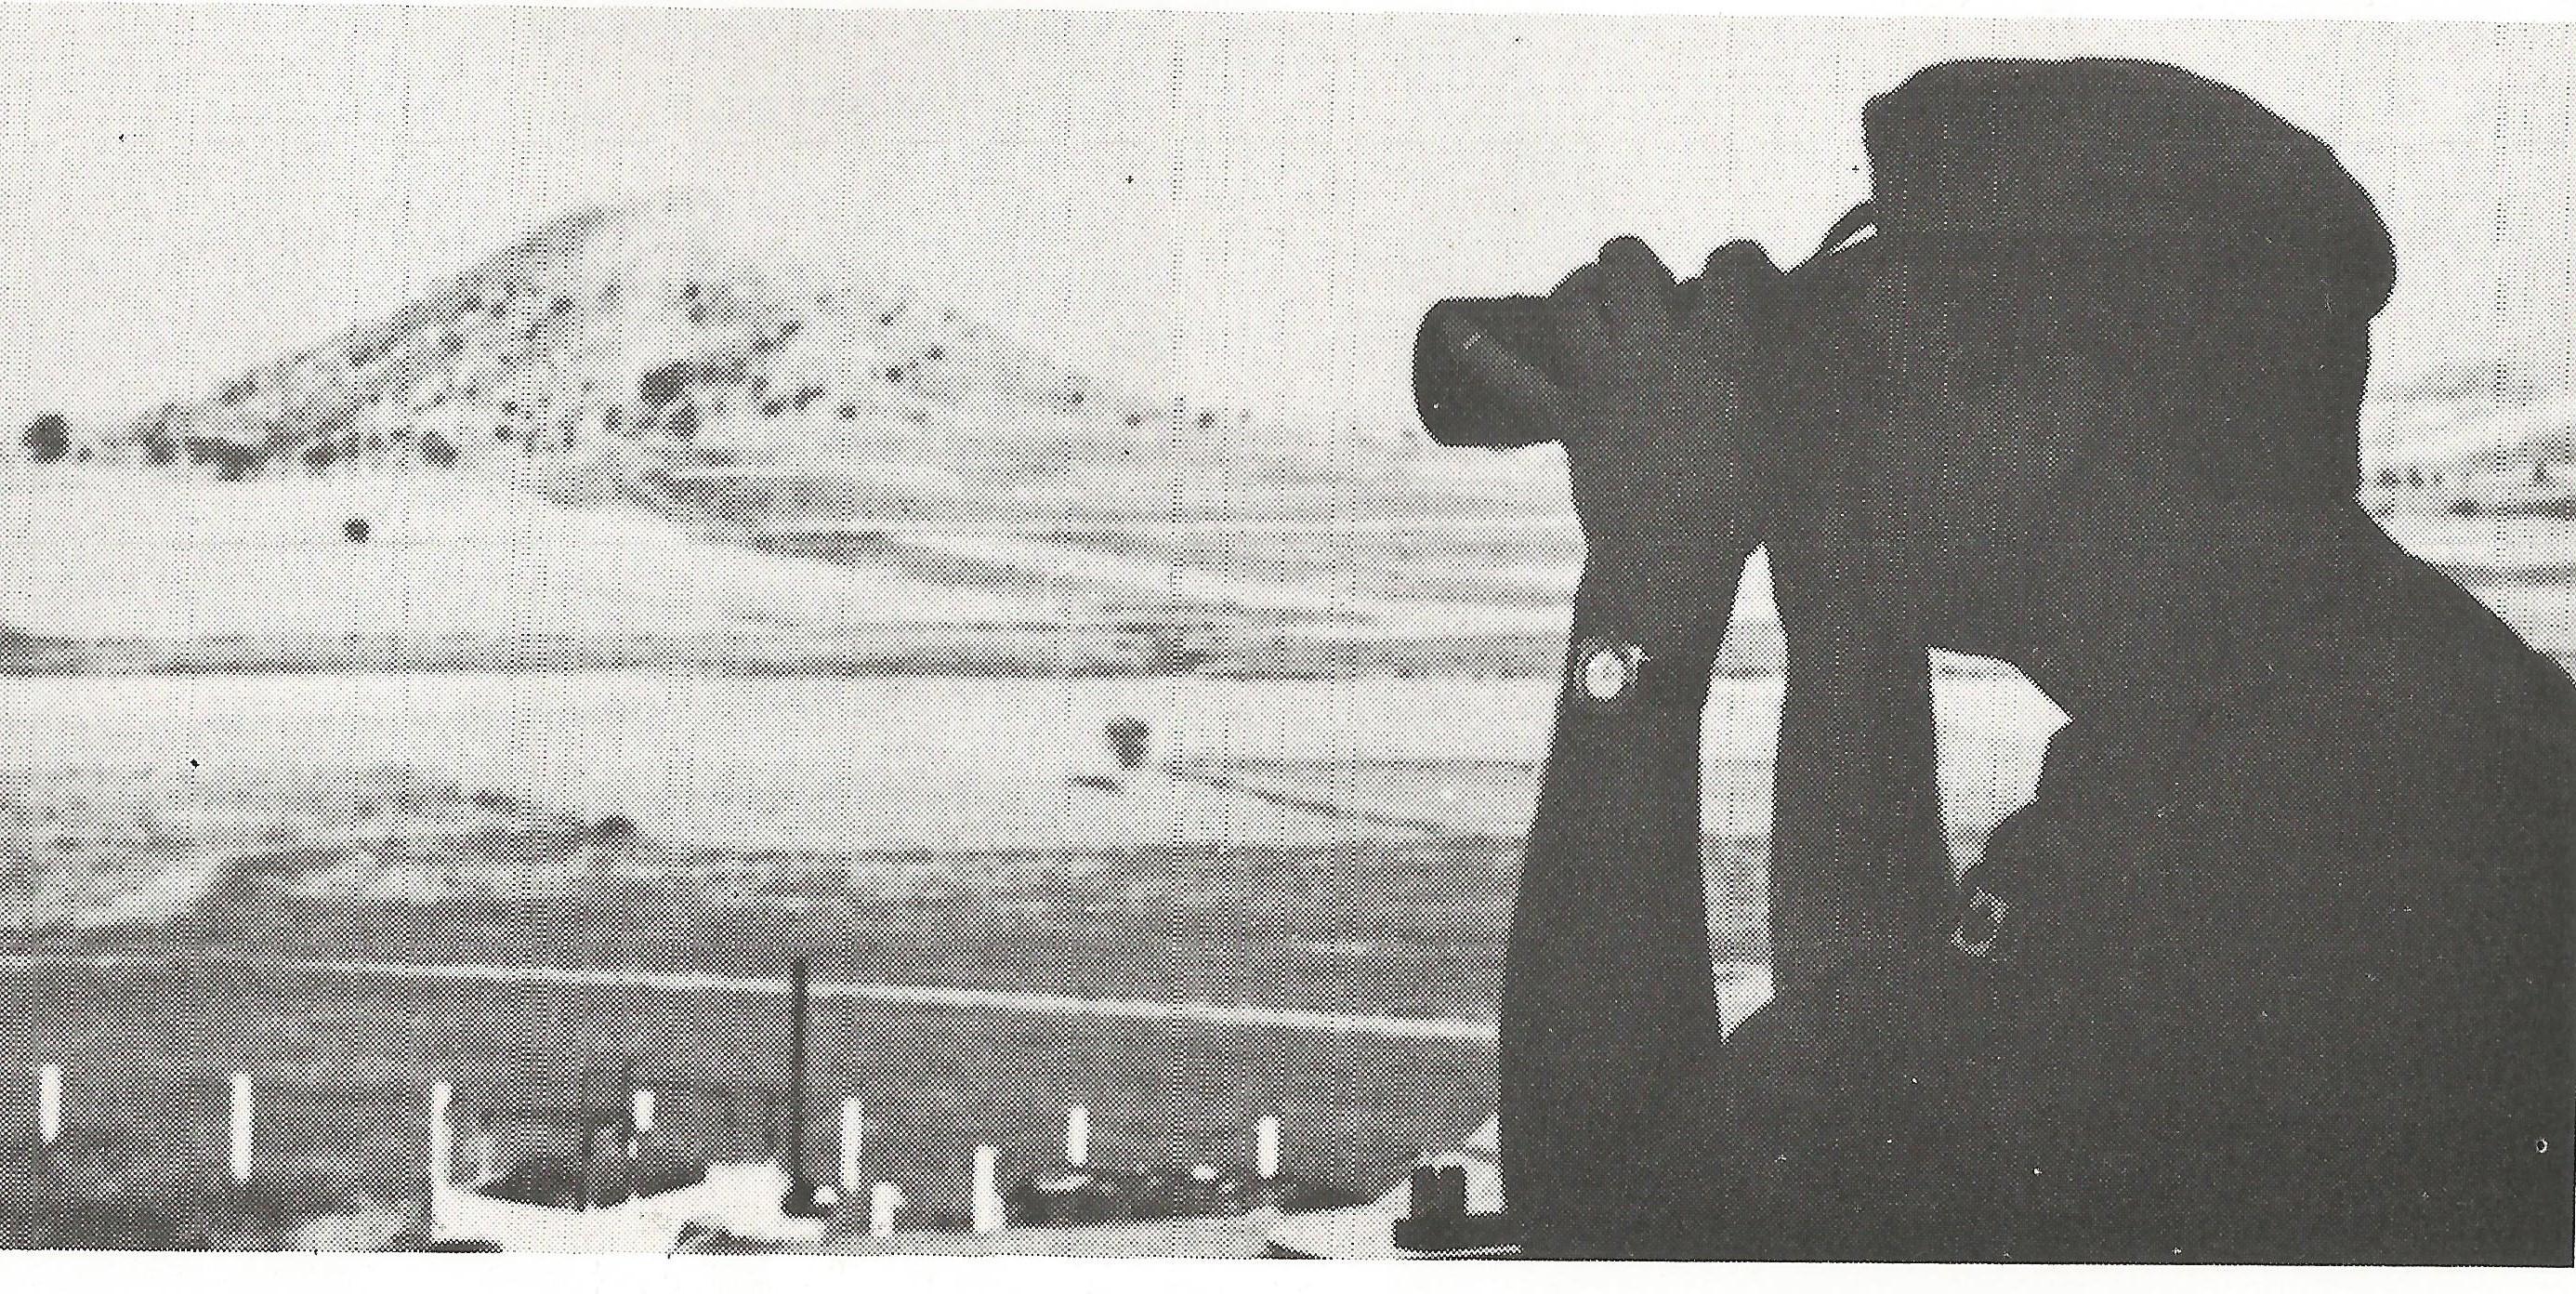 Cyprus 1974 Part IV: UN Outpost Louroujina